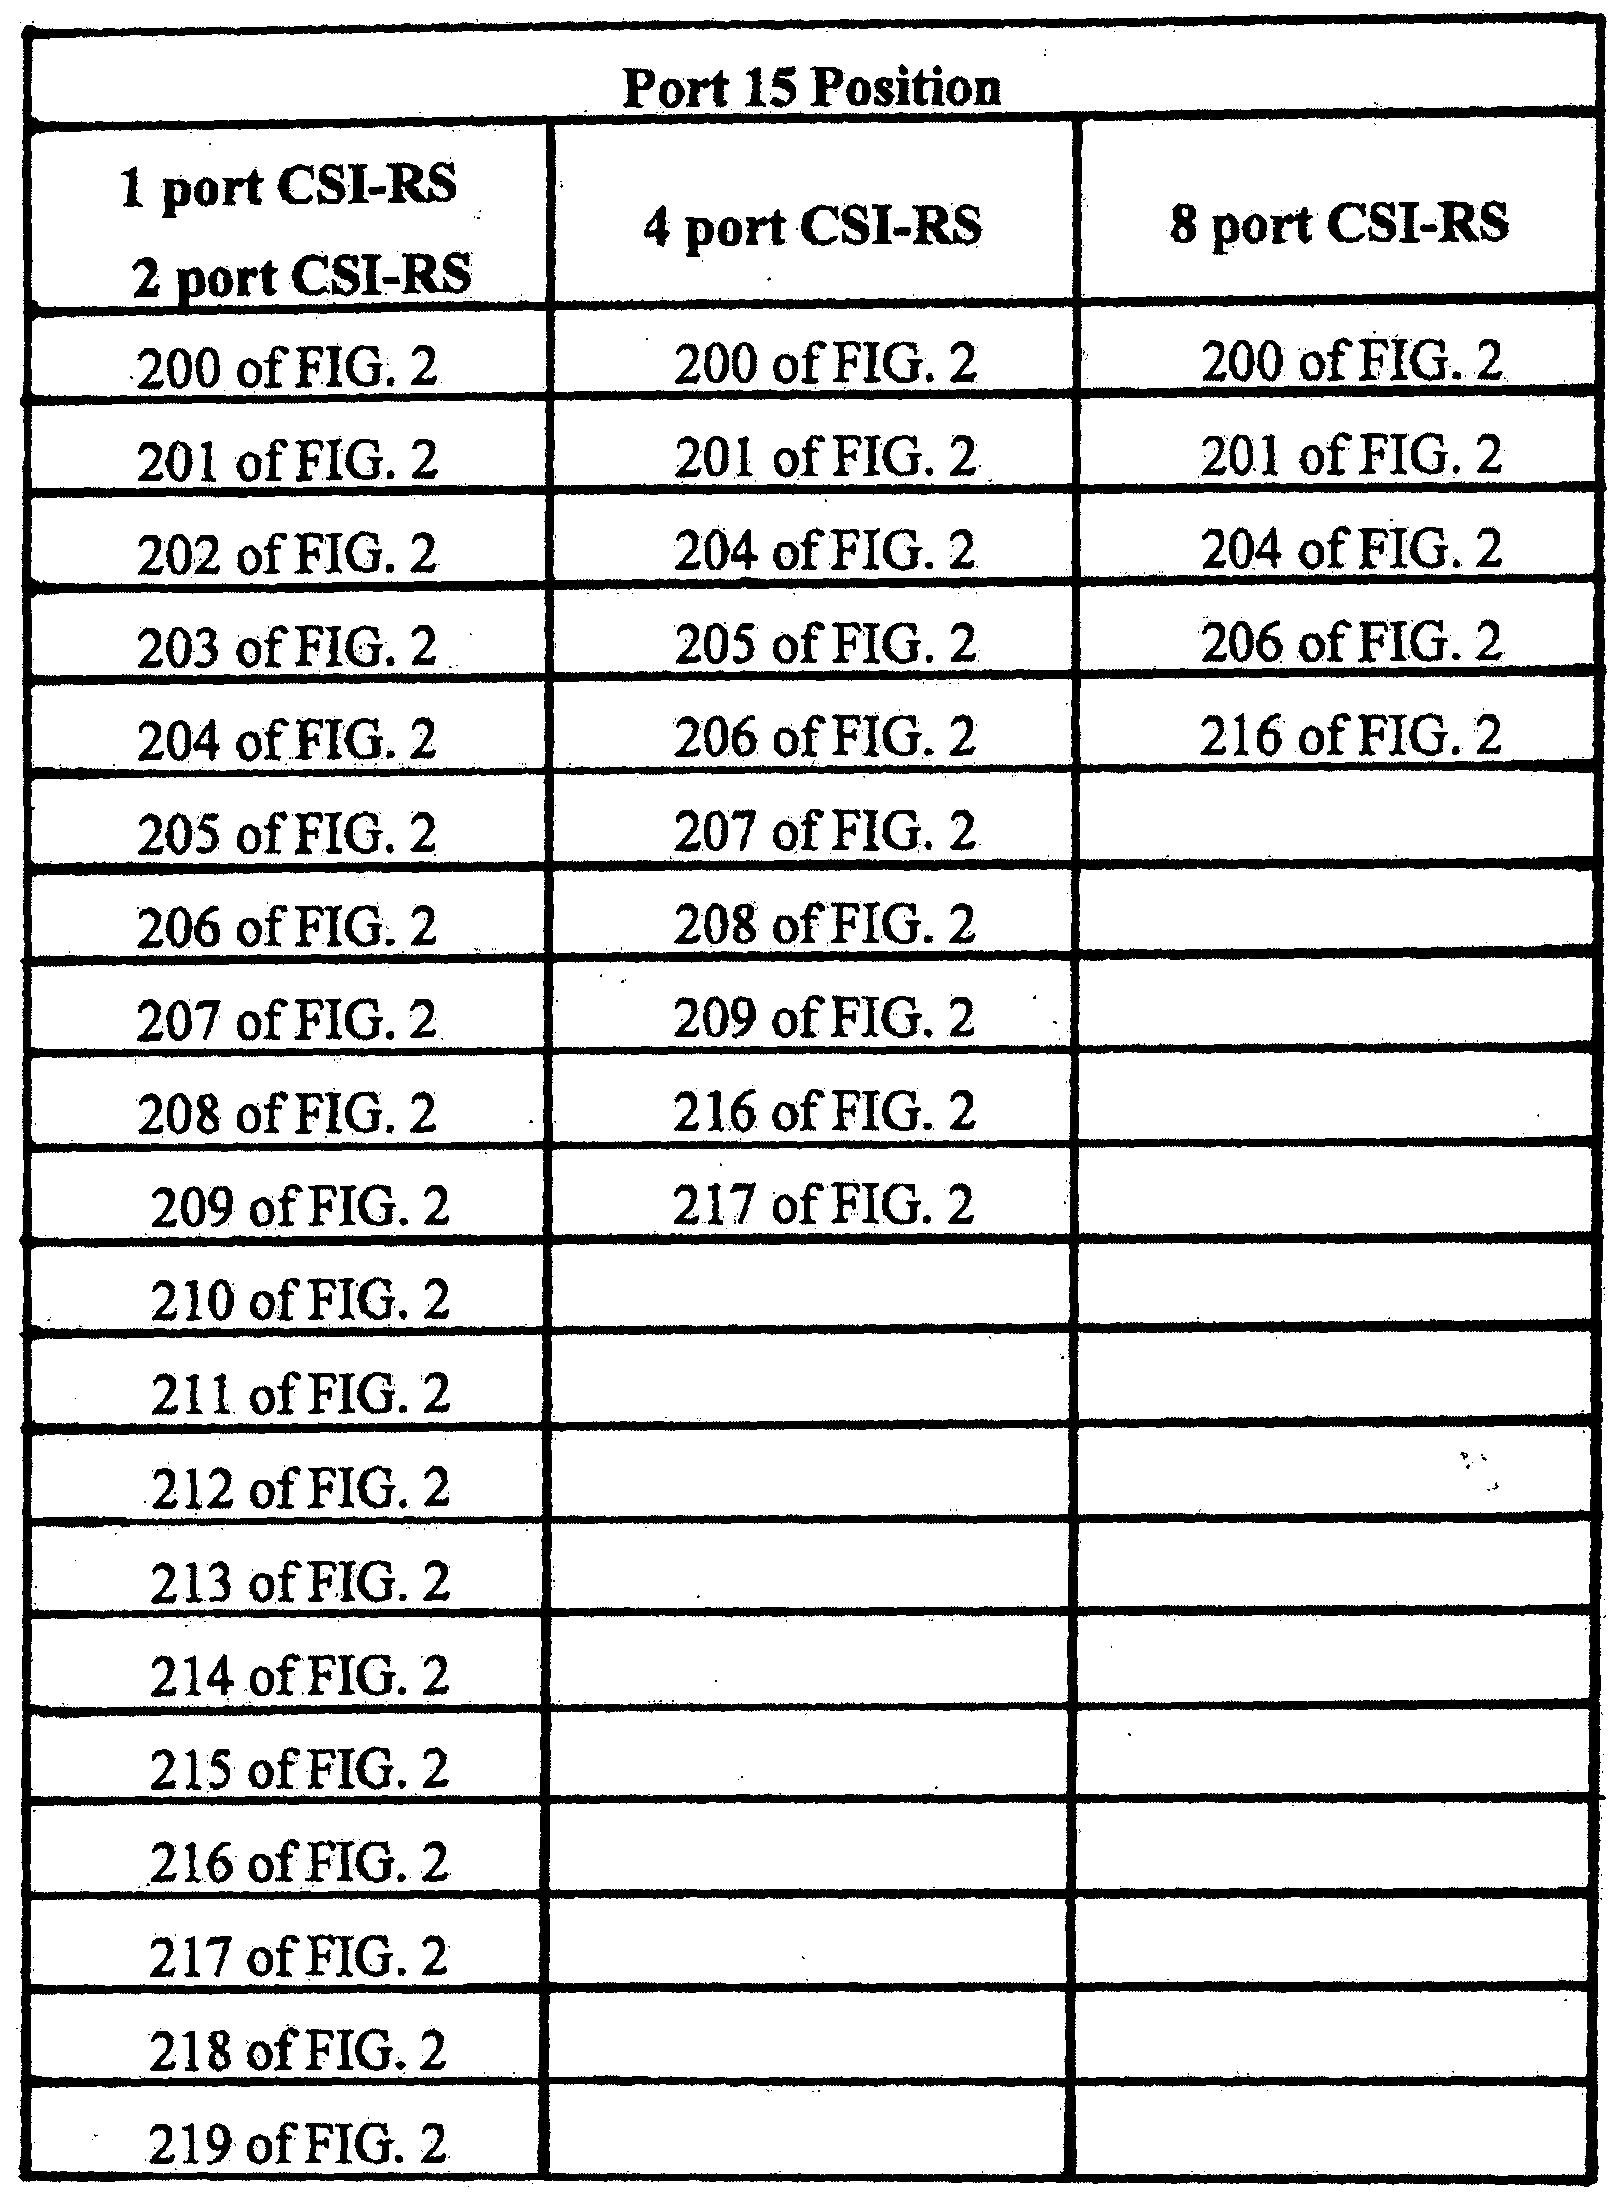 Figure WO-DOC-FIGURE-50